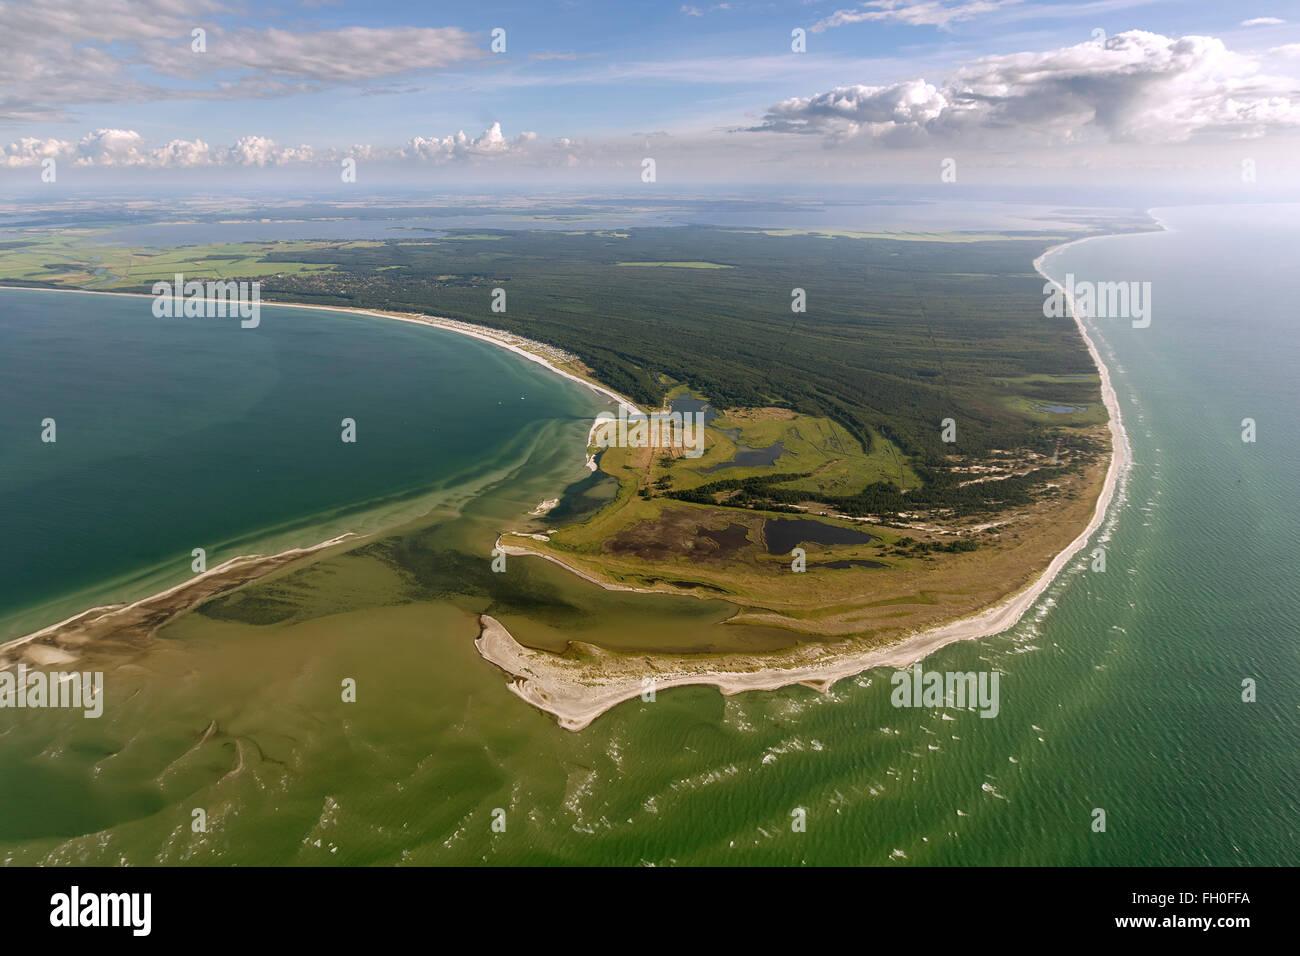 Aerial view, Darsser Ort, Darßer Ort, Baltic, Libbertsee, National Park Darsser-place Prerow, Baltic Sea, Mecklenburg - Stock Image